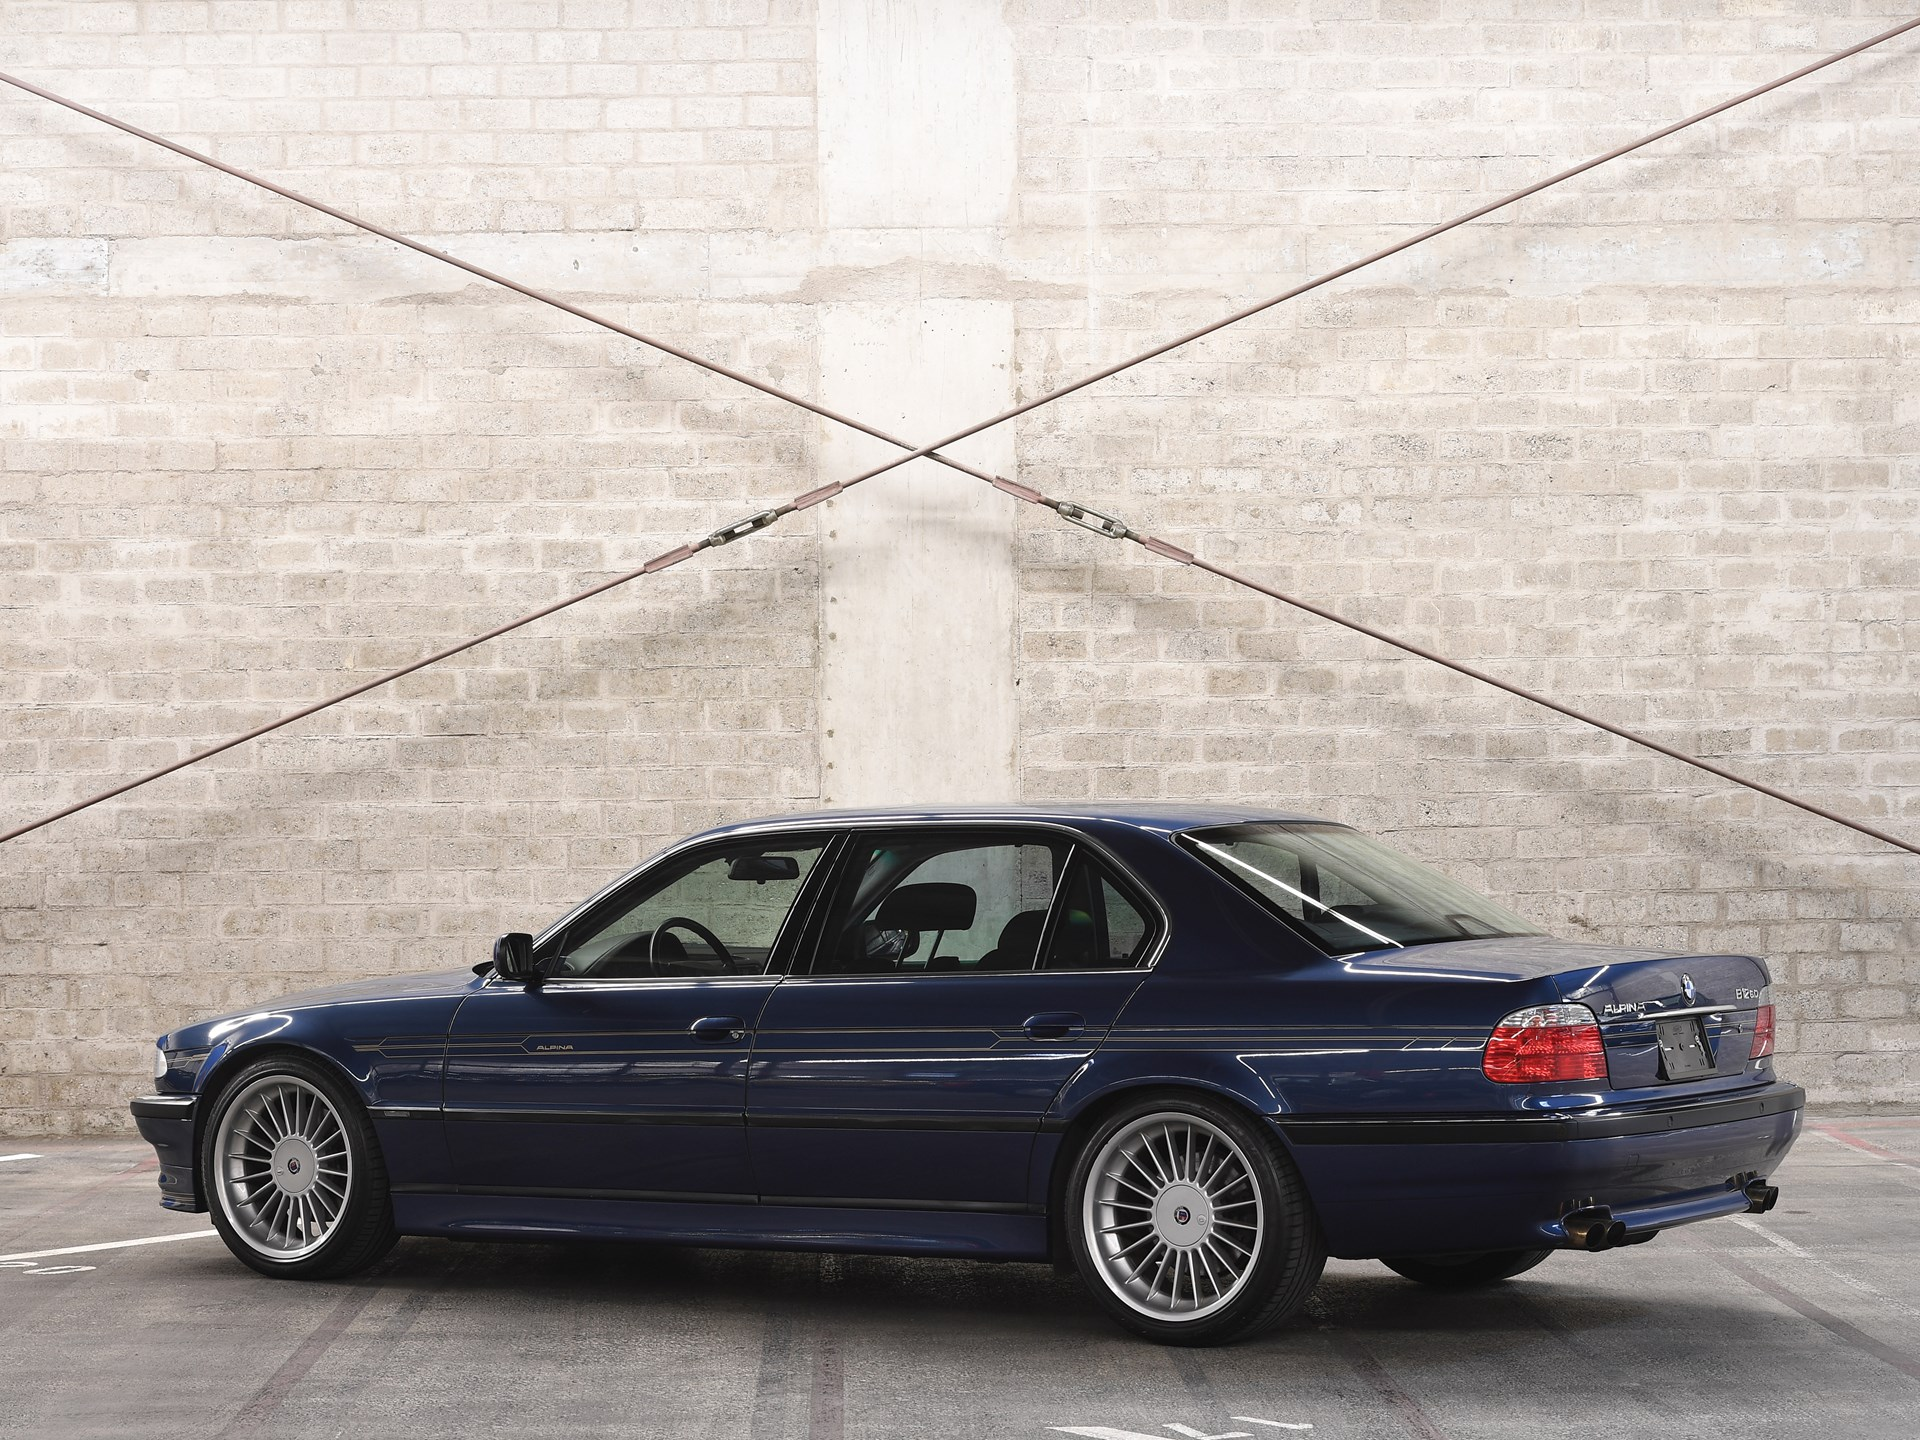 2000 BMW Alpina B12 6.0 Langversion